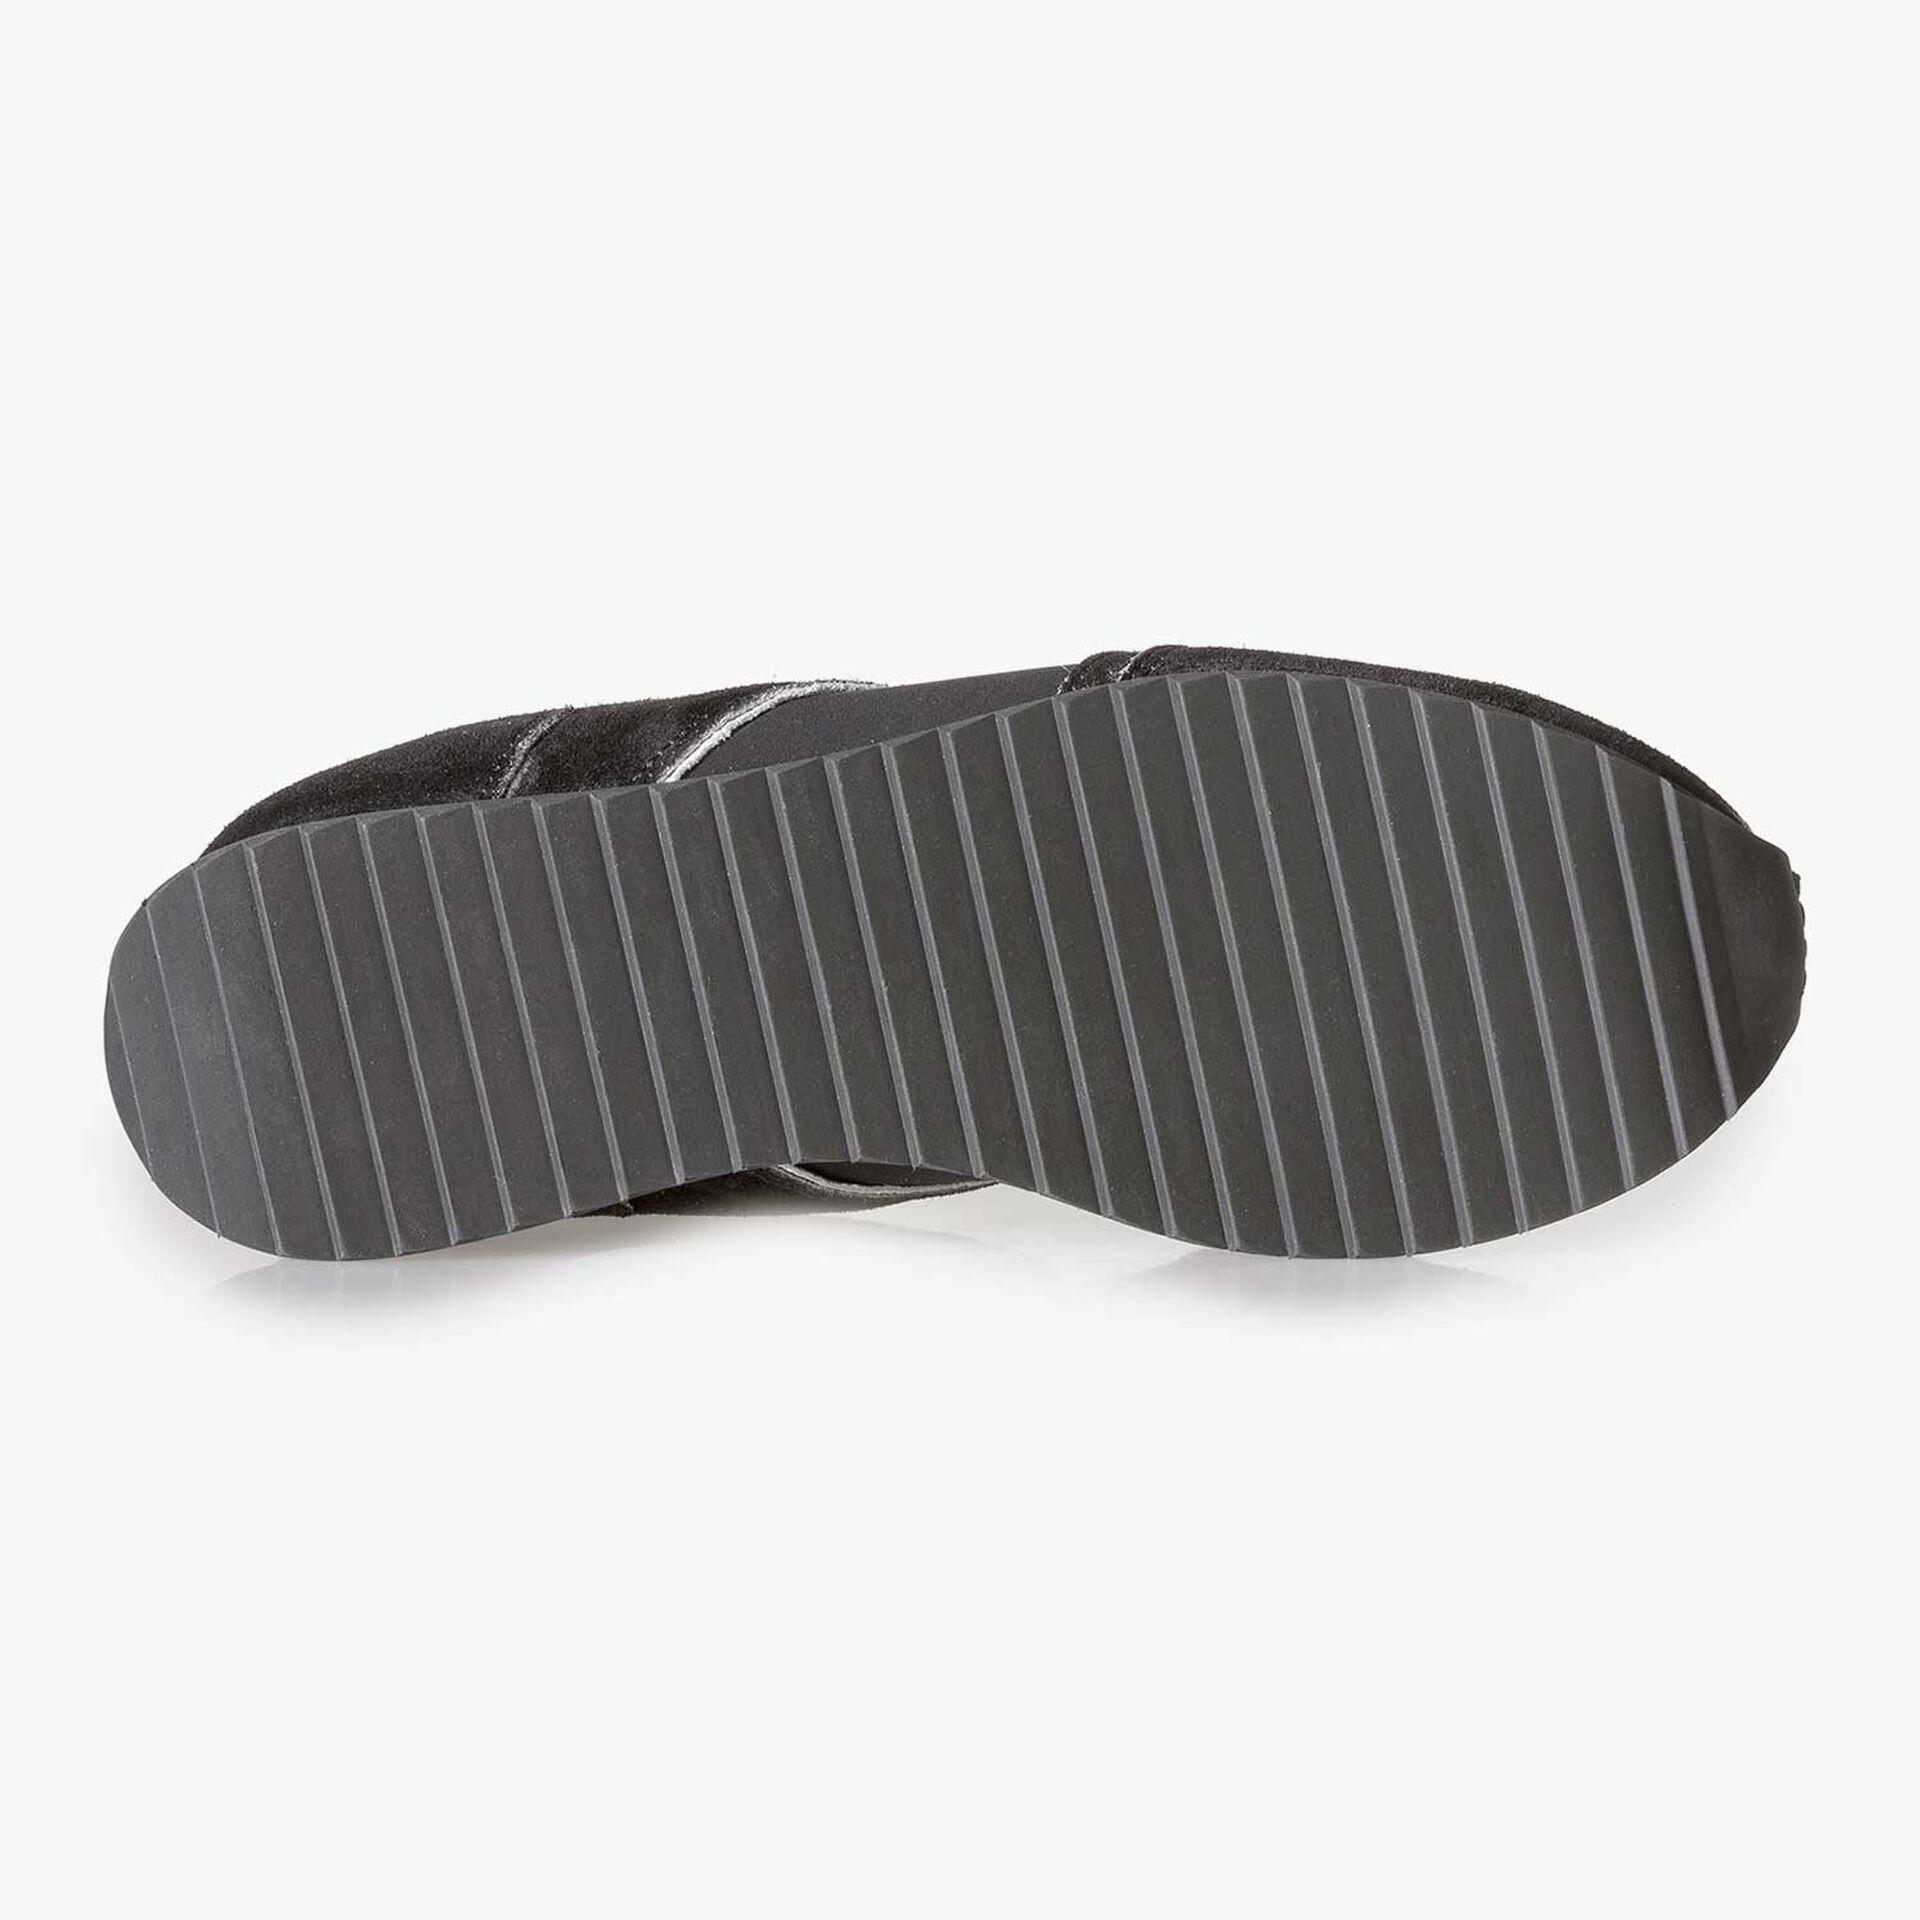 Black suede leather sneaker